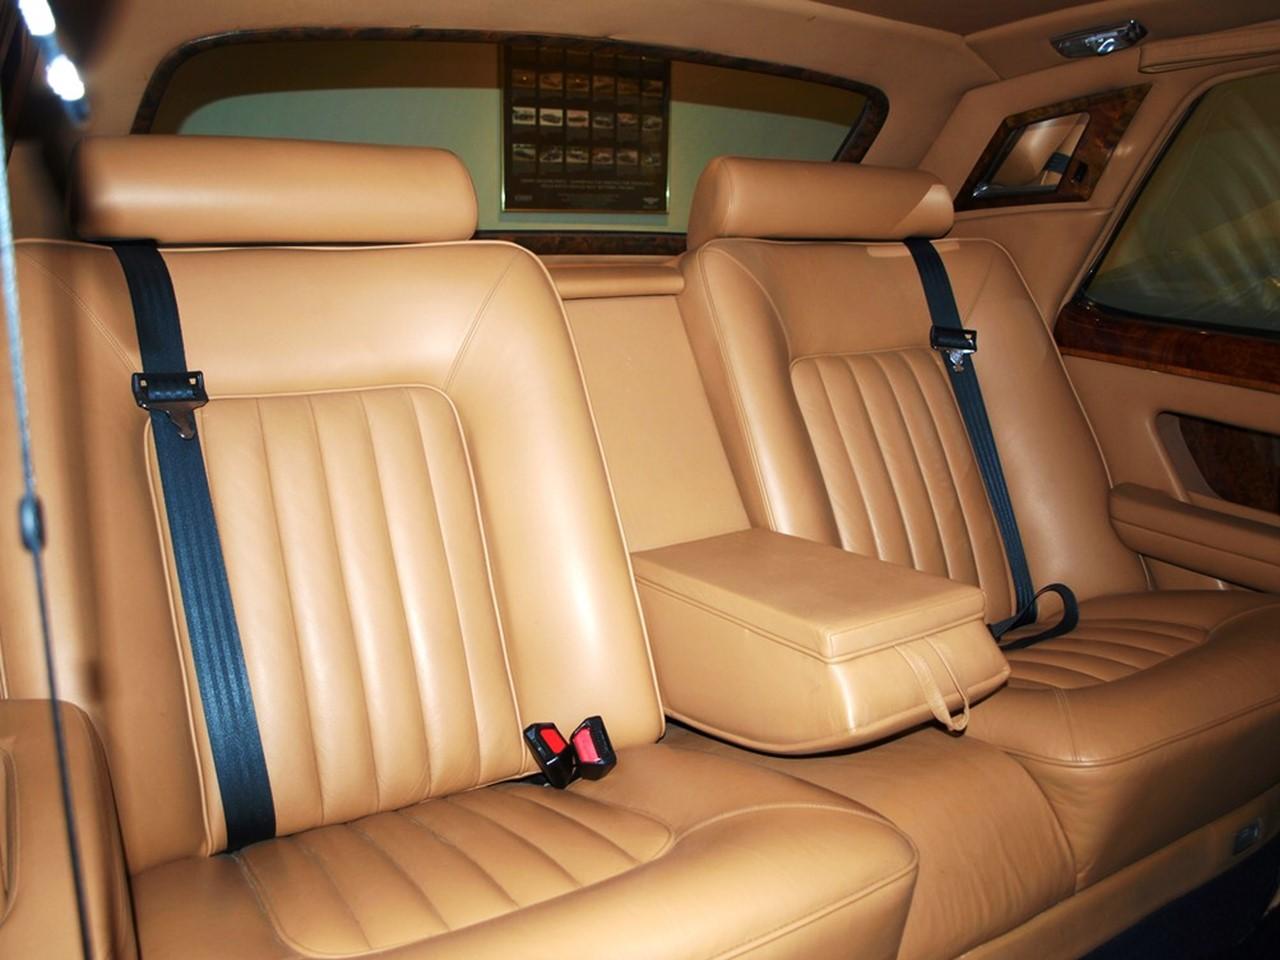 1988 Silver Spirit coupe 3